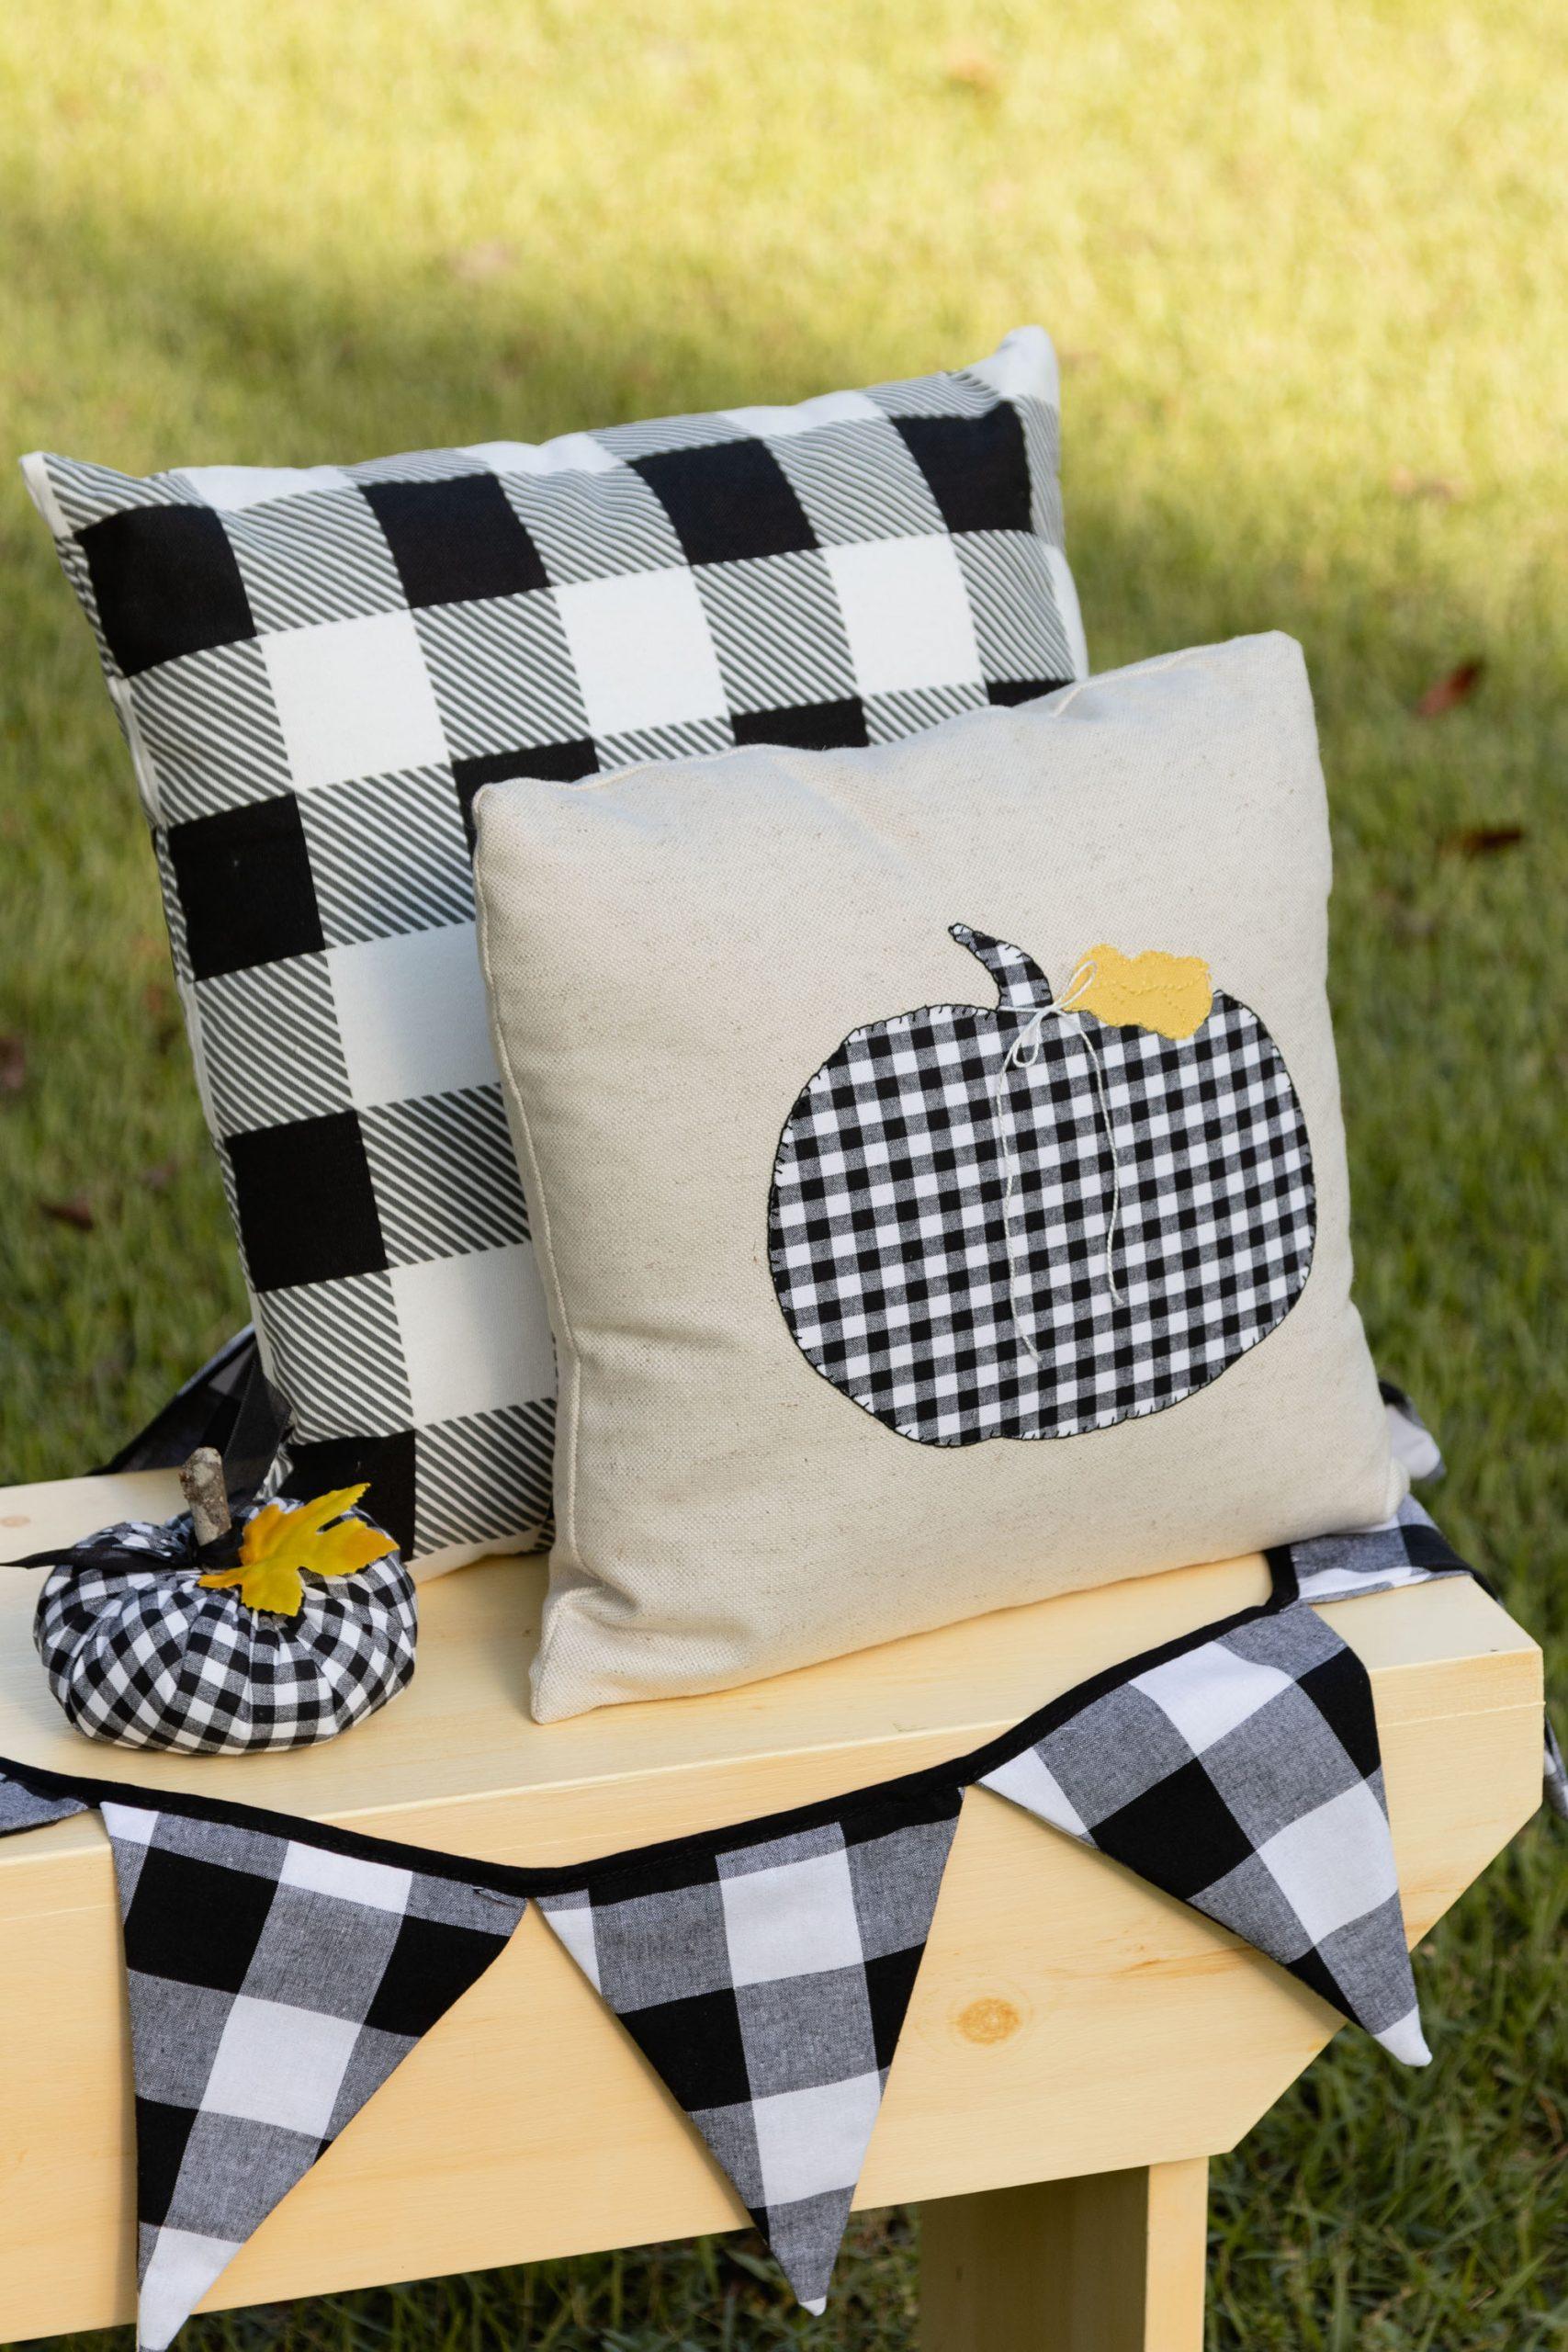 Black and White Check Pumpkin Pillow Applique DIY